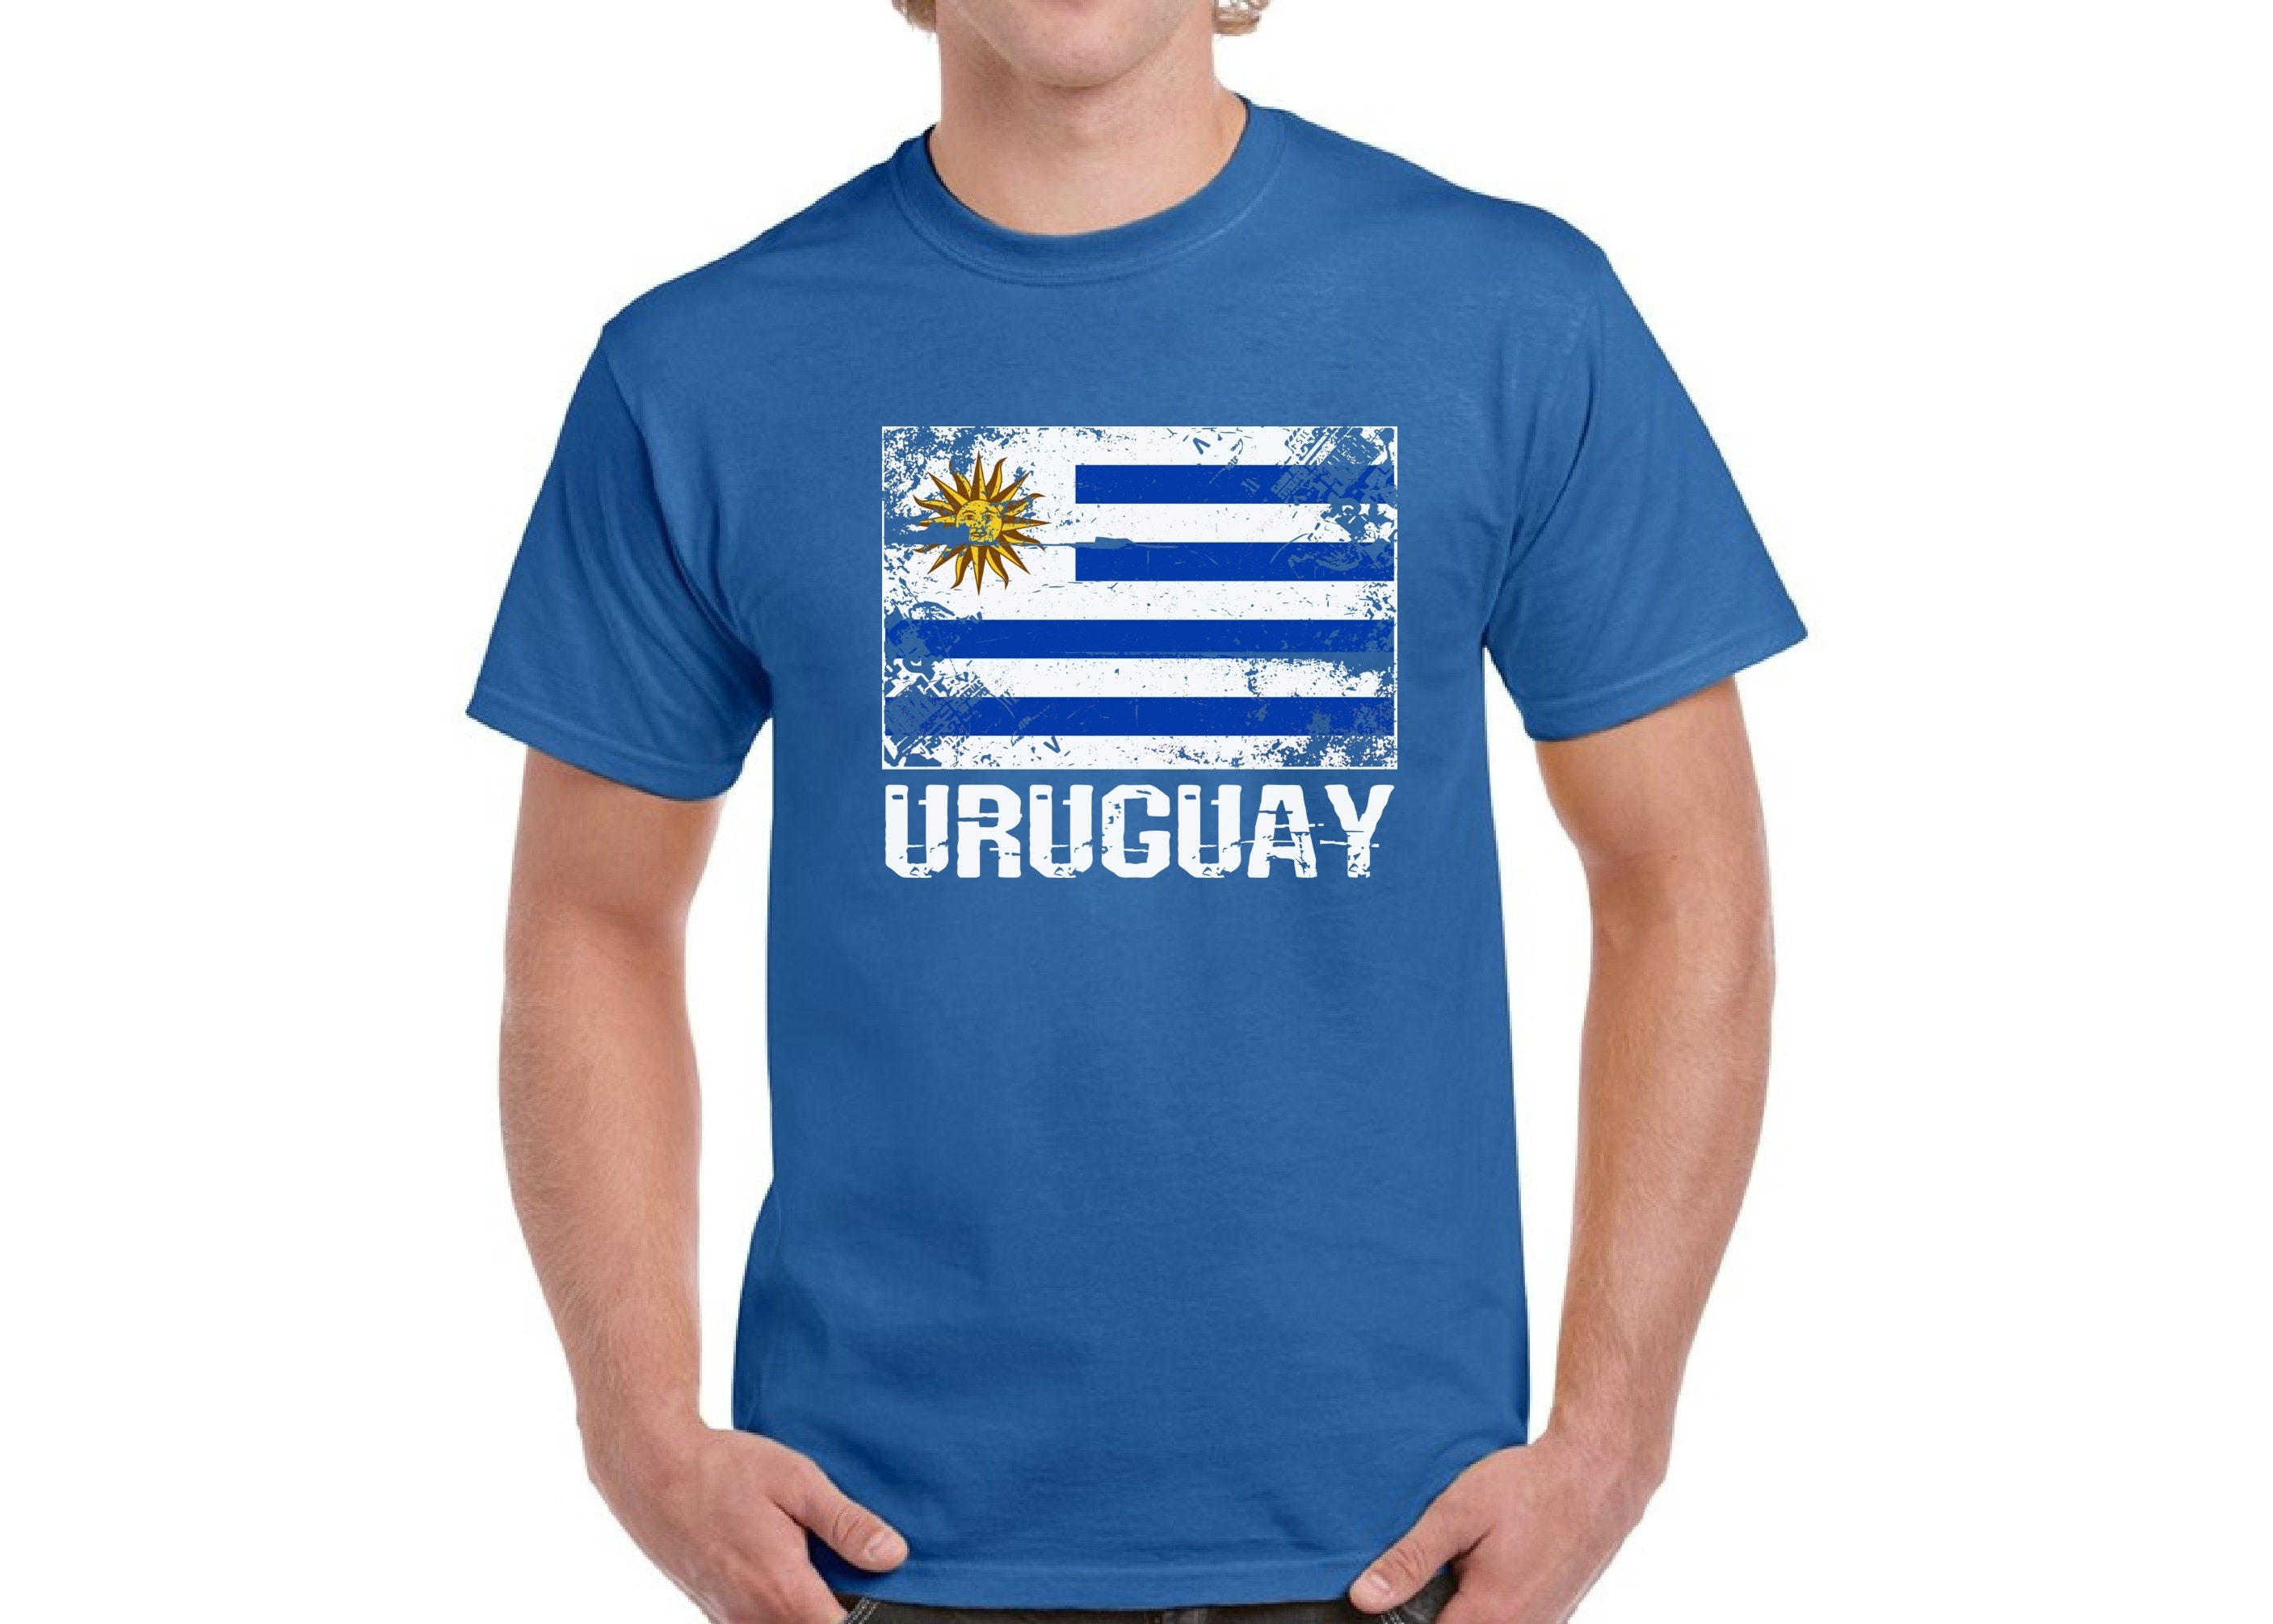 Uruguay Shirt For Men Uruguay Flag Shirt Uruguayan Soccer Shirts Uruguay 2018 T-shirt Gifts From Uruguay Uruguayan Mens Shirt Uruguay Gifts Unisex Tshirt